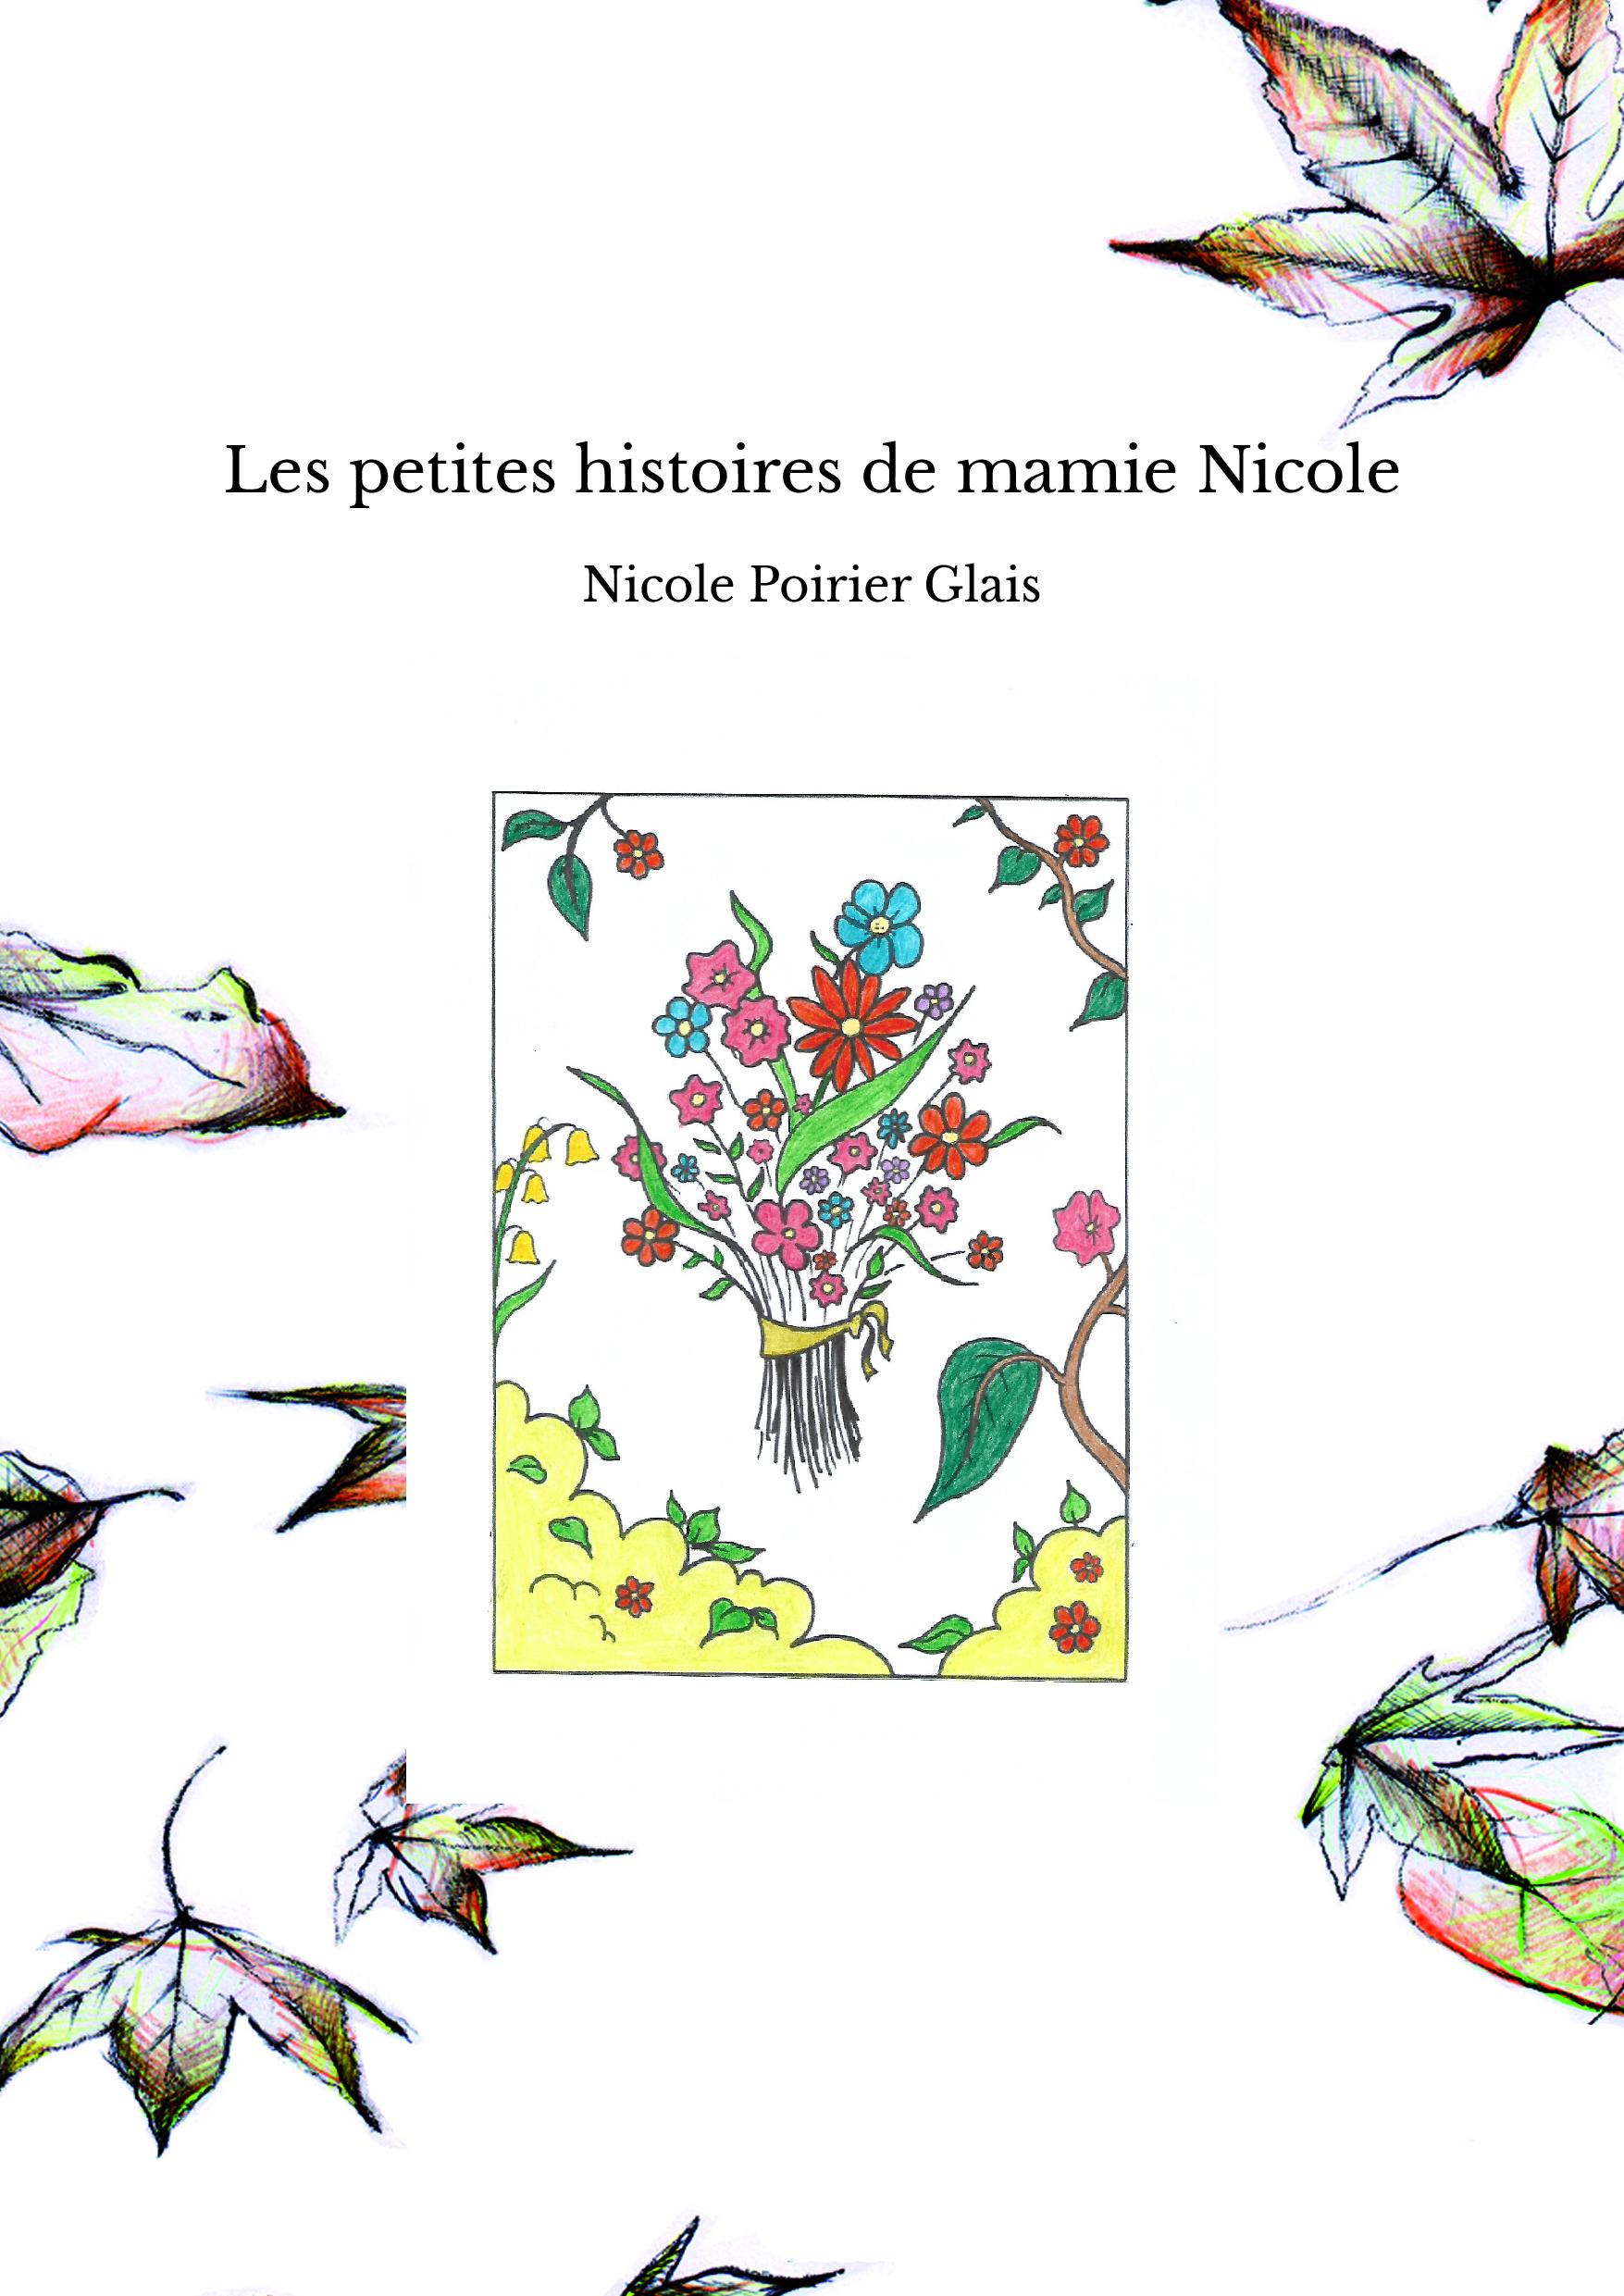 Les petites histoires de mamie Nicole